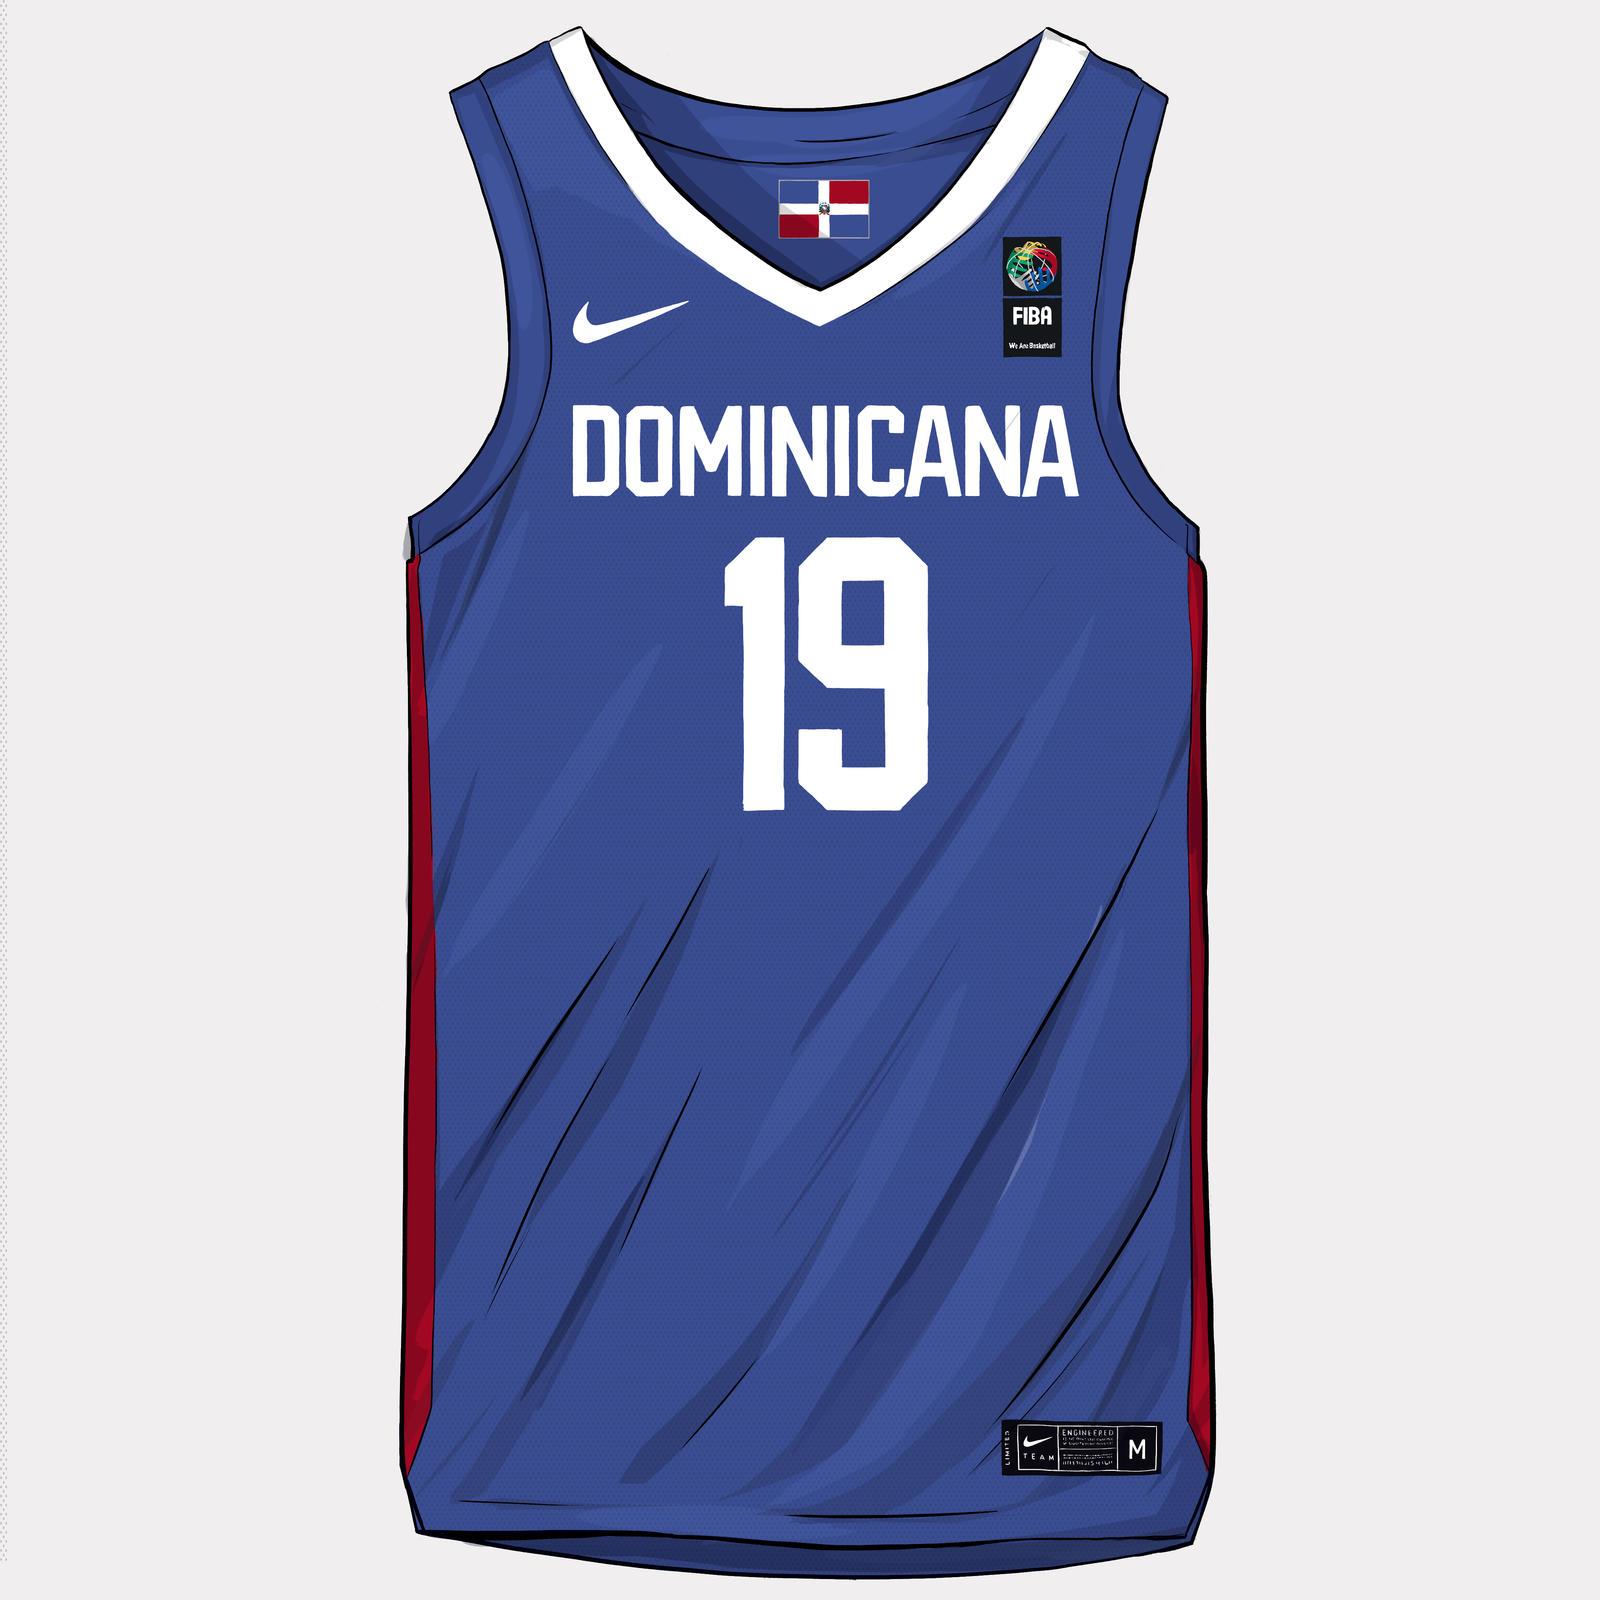 nike-news-dominican-republic-national-team-kit-2019-illustration-1x1_1_89509.jpg